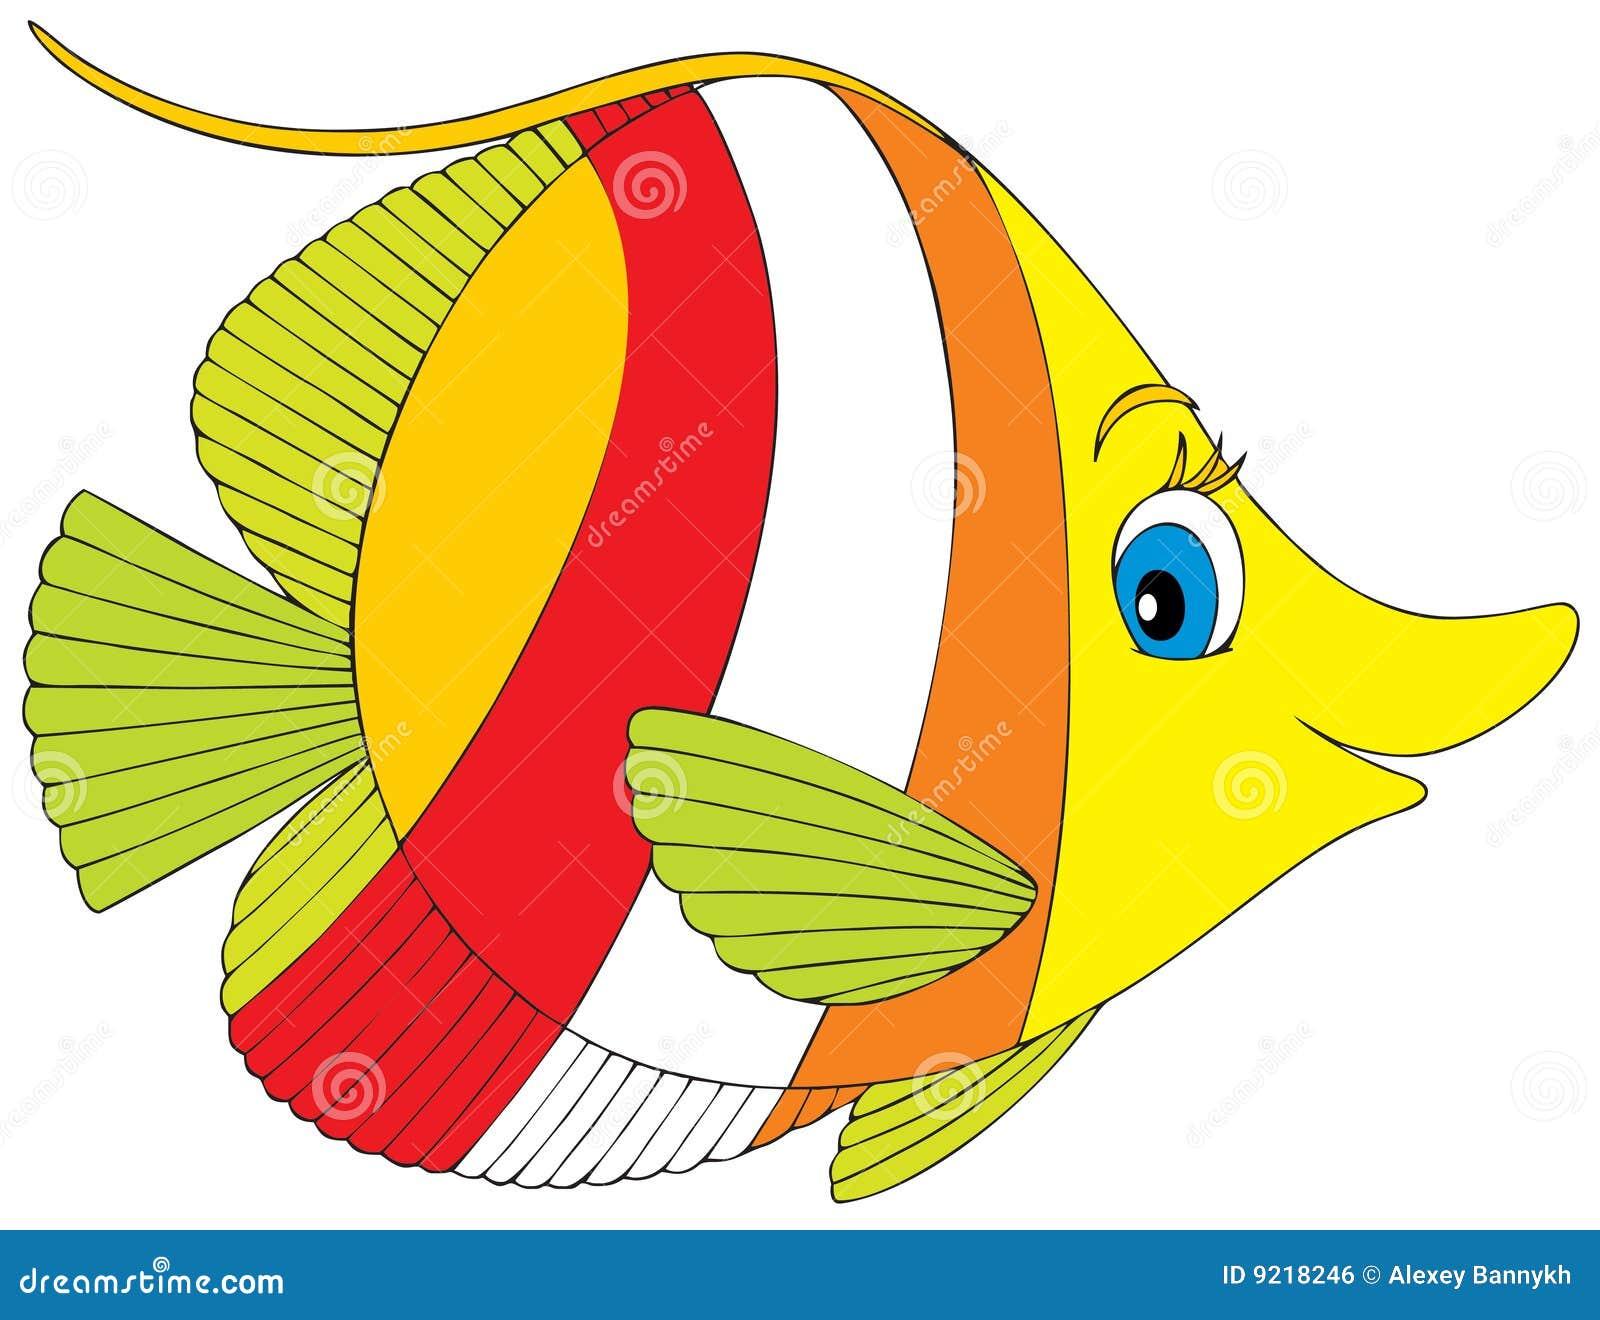 Items similar to Aquarium Clipart - Clip Art of Salt Water Fish Images -  Commercial Use - INSTANT Download on Etsy | Fish art, Salt water fish,  Colorful fish